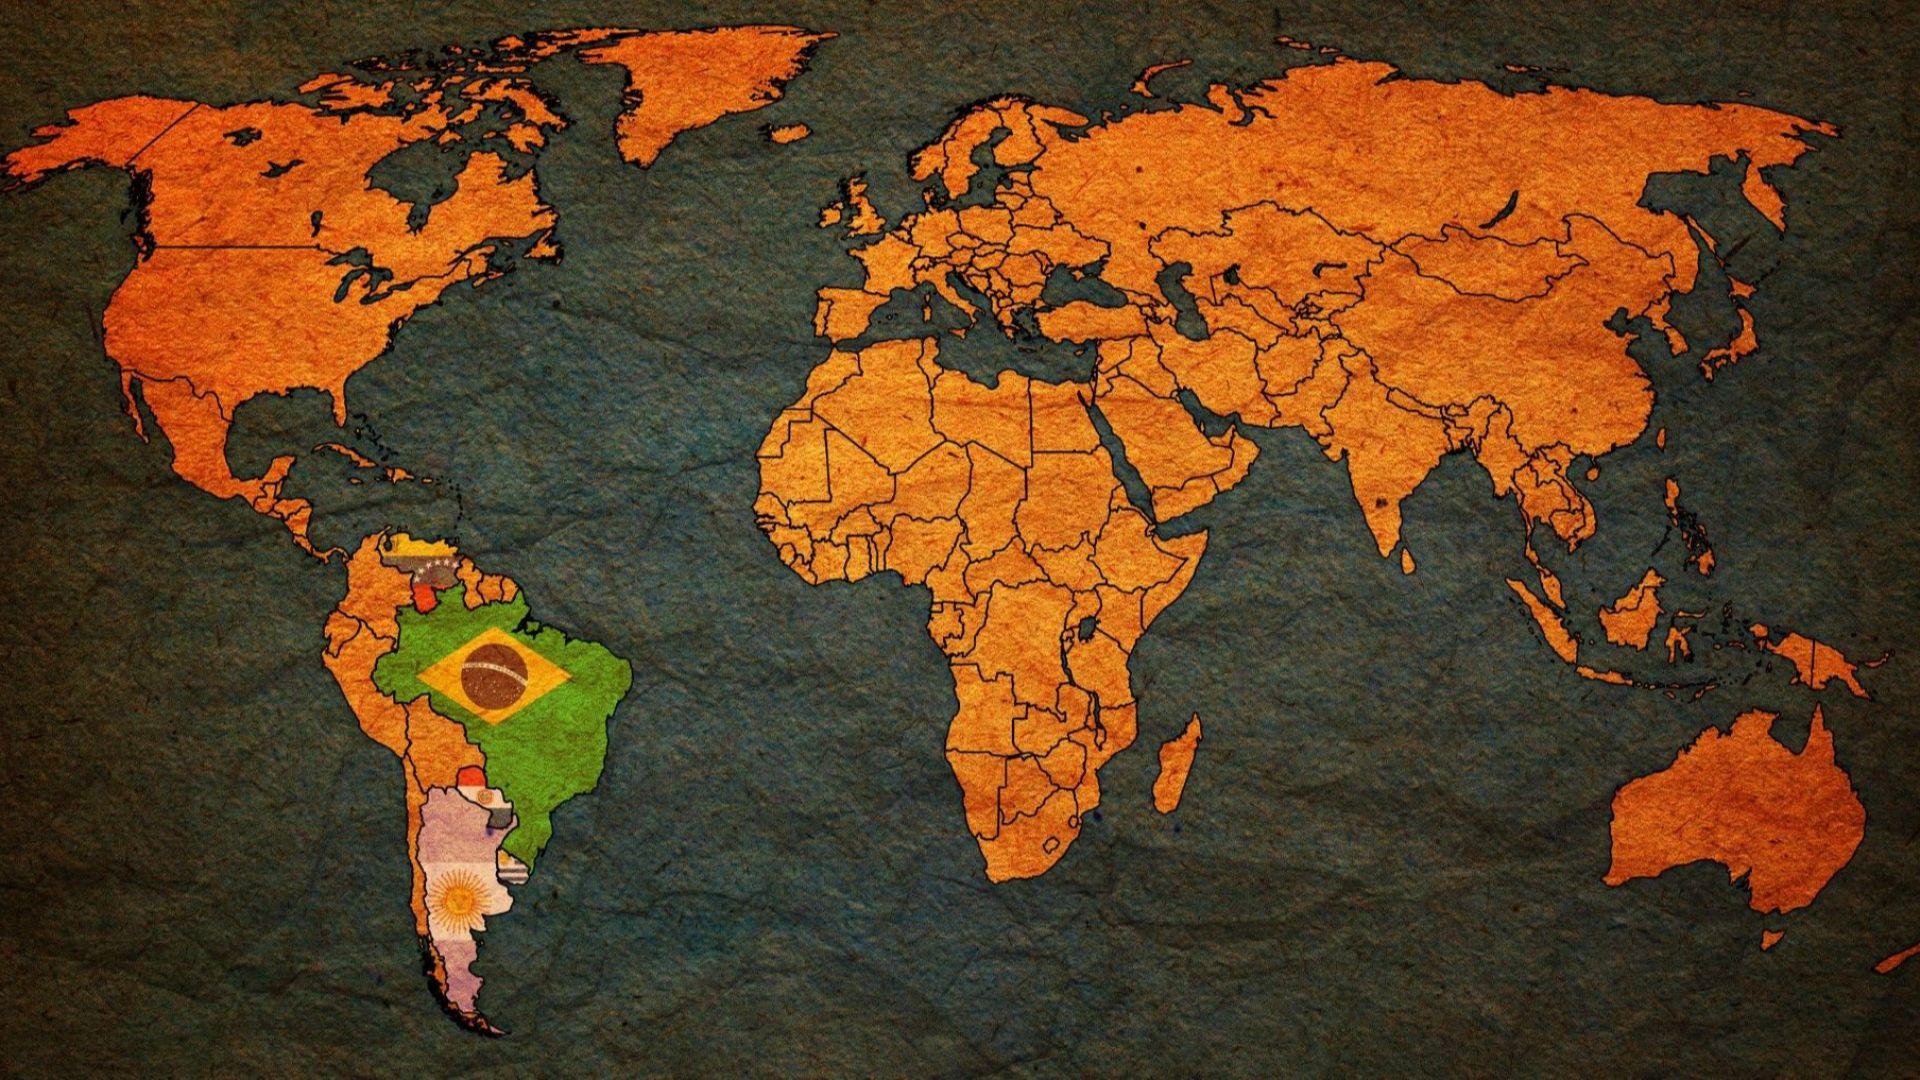 Петата по големина икономика на света - блокът Меркосур, стана на 30 години